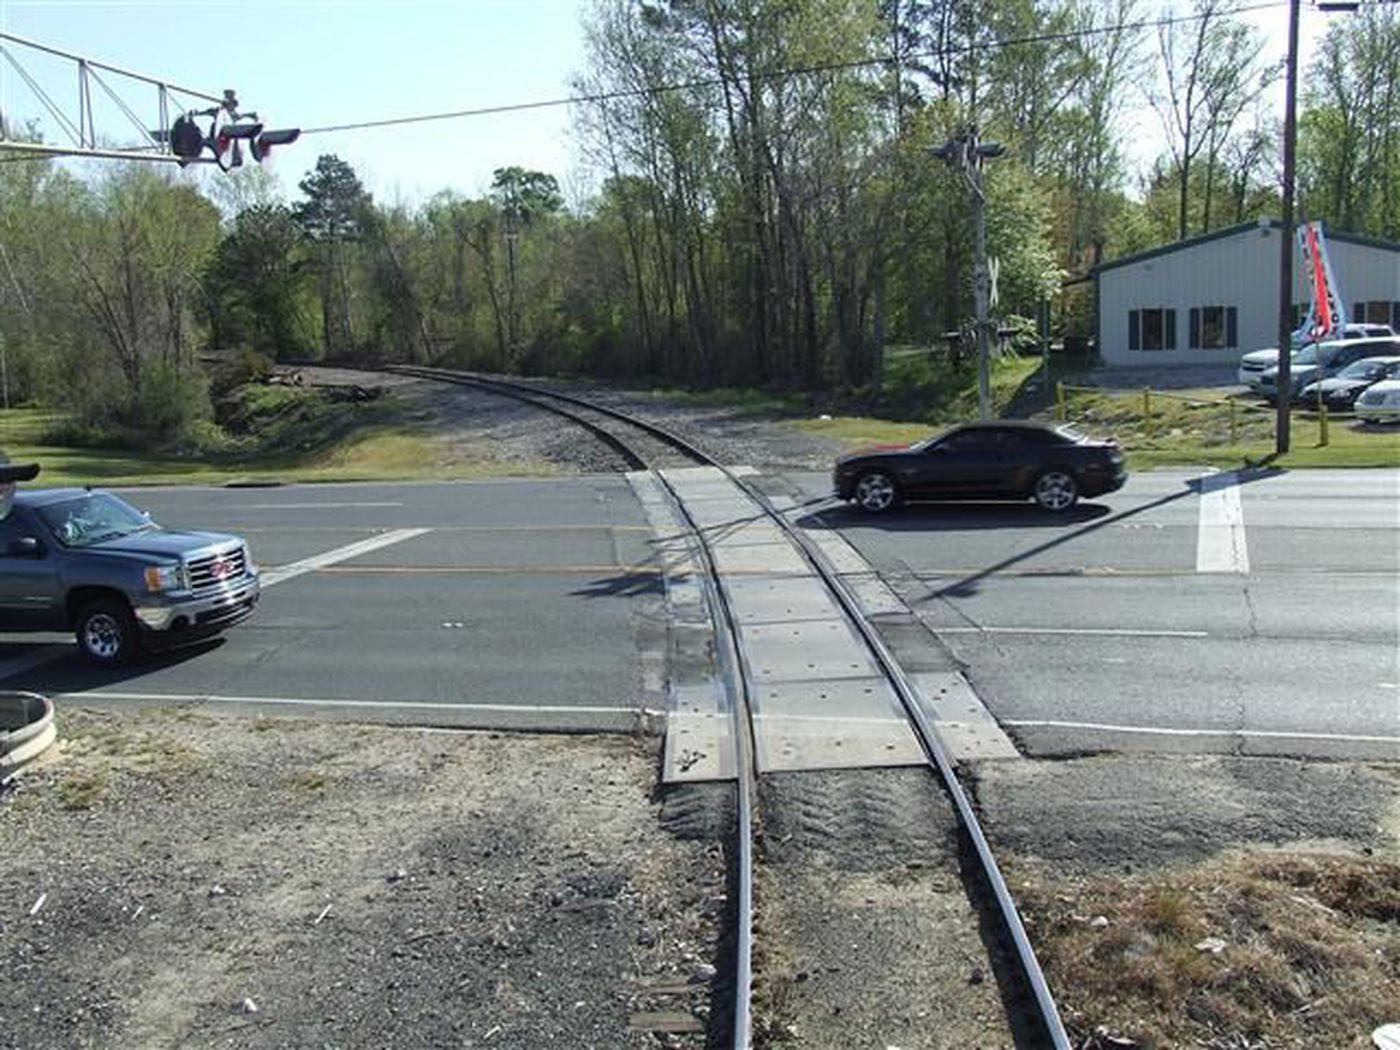 LSP, KCS perform railroad grade crossing enforcement detail